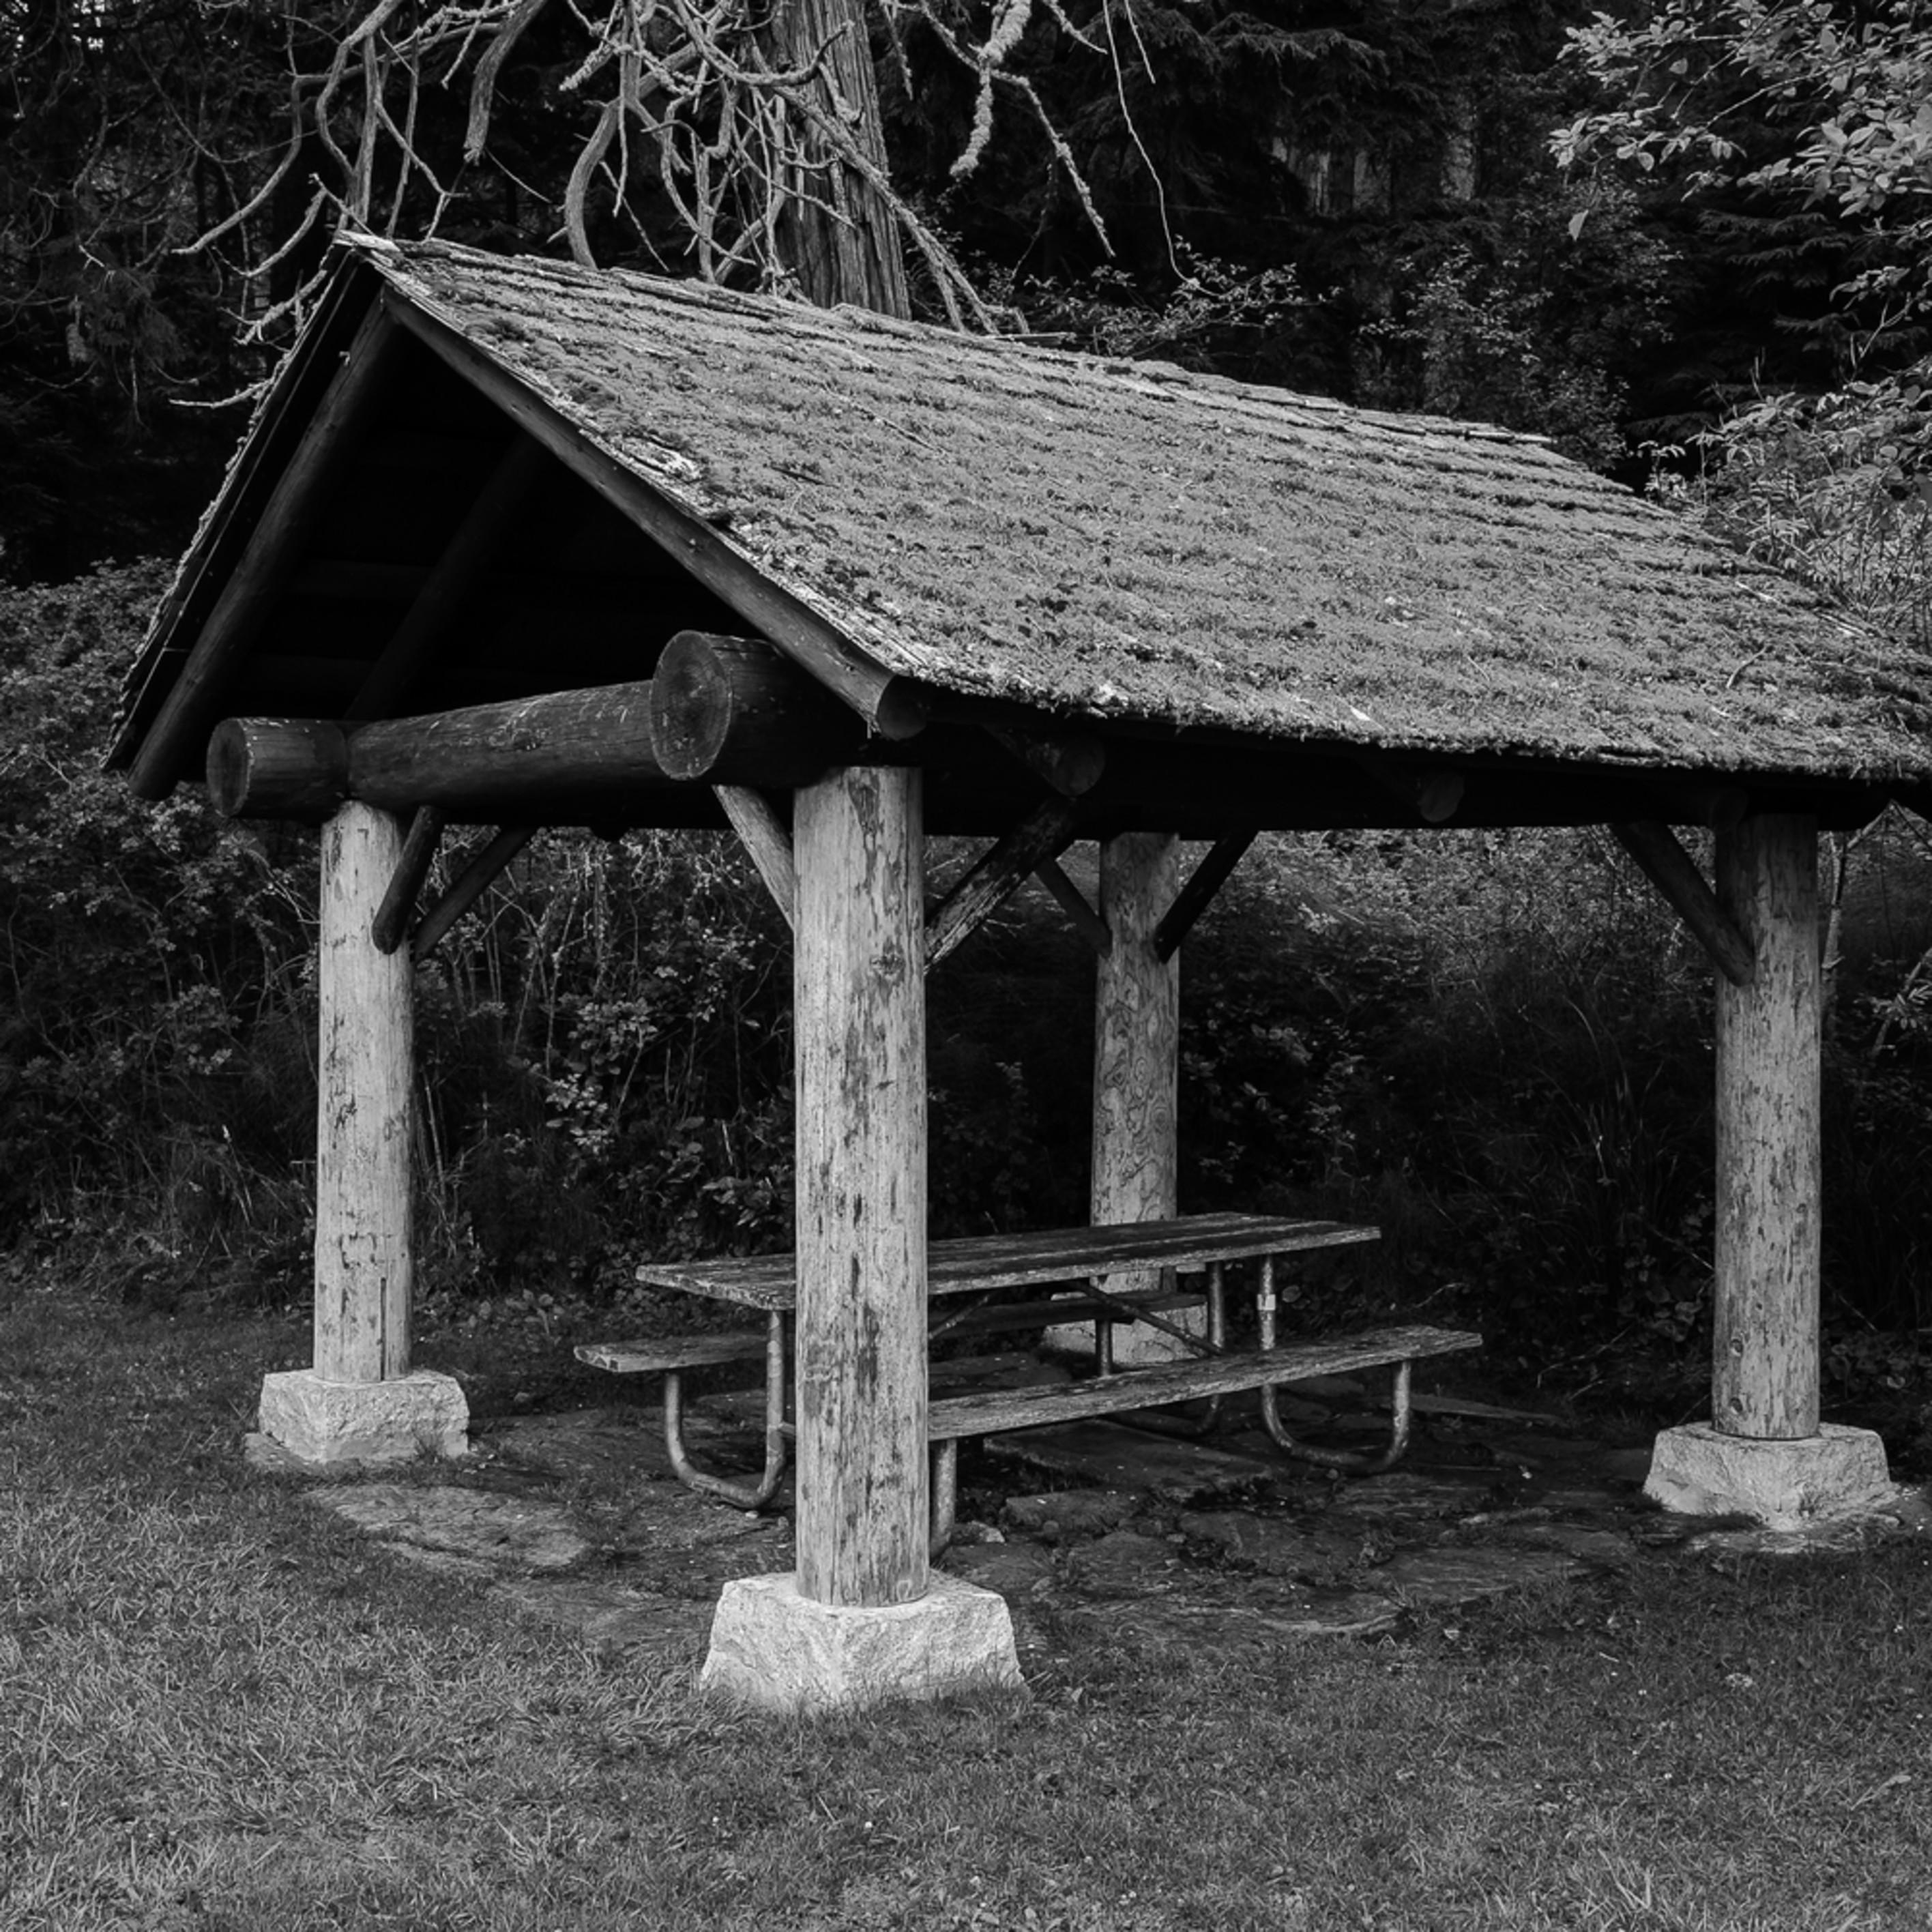 Bowman bay picnic shelter deception pass state park washington 2016 ly2et9